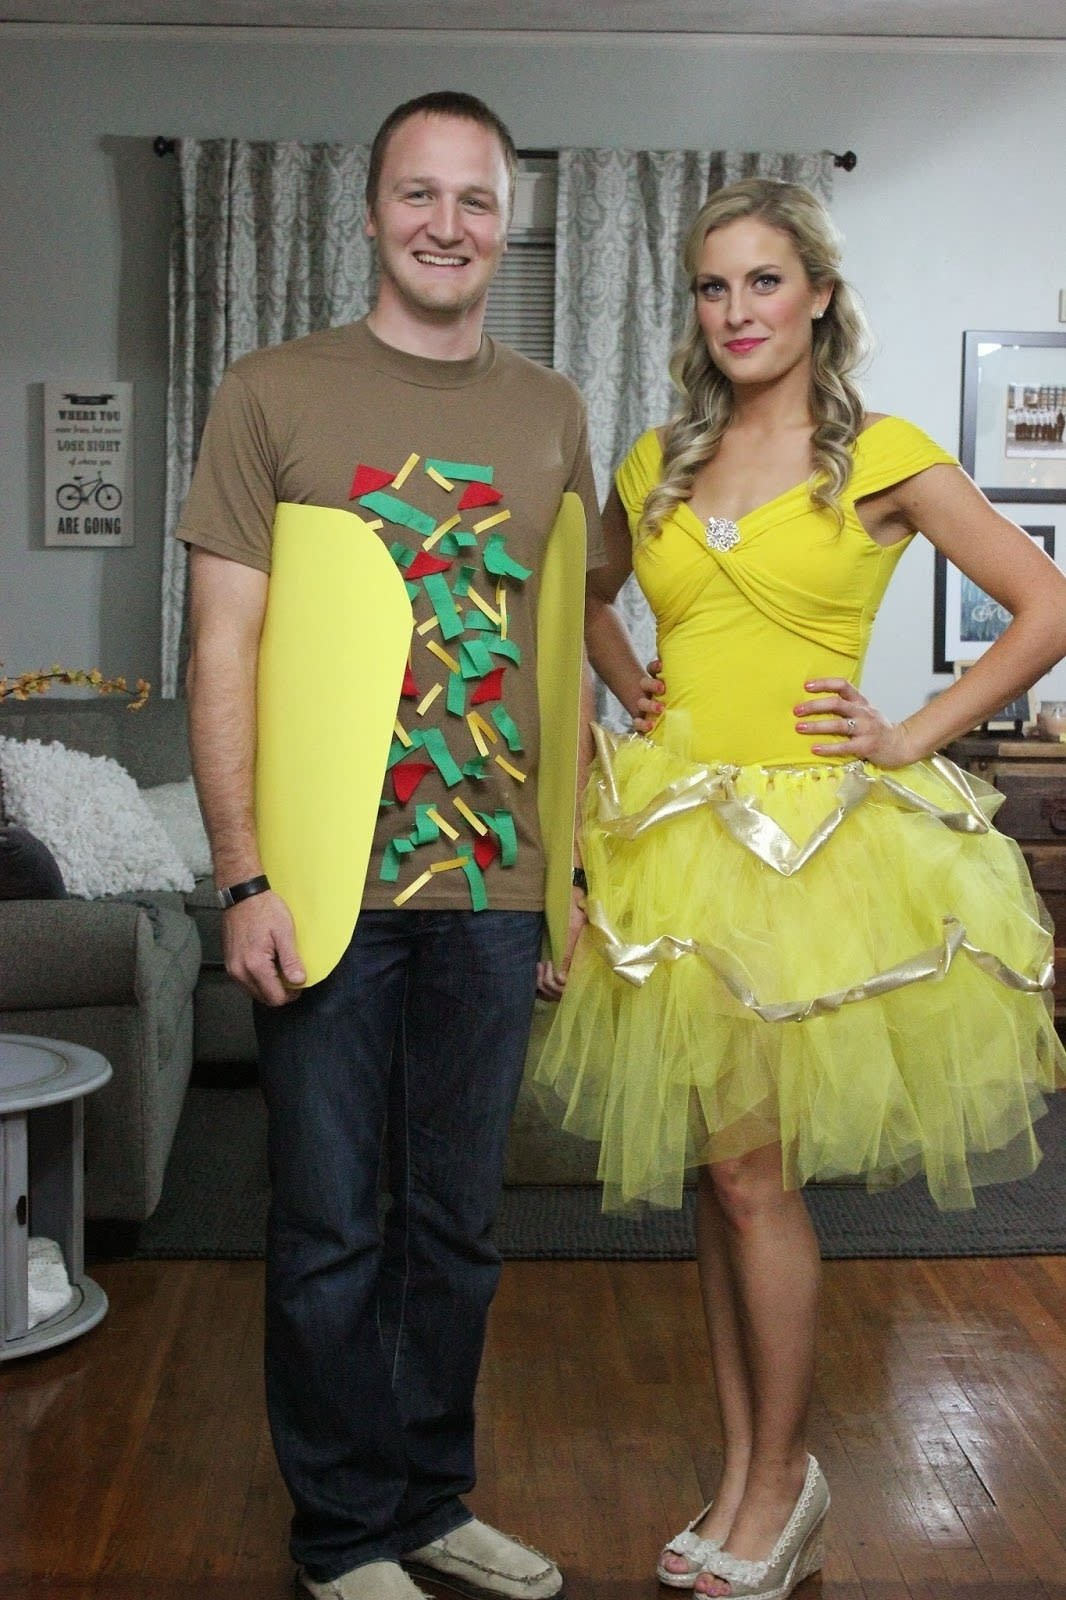 10 Gorgeous Couples Halloween Costumes Ideas Unique 57 couples diy costumes best 25 halloween couples ideas on 6 2020